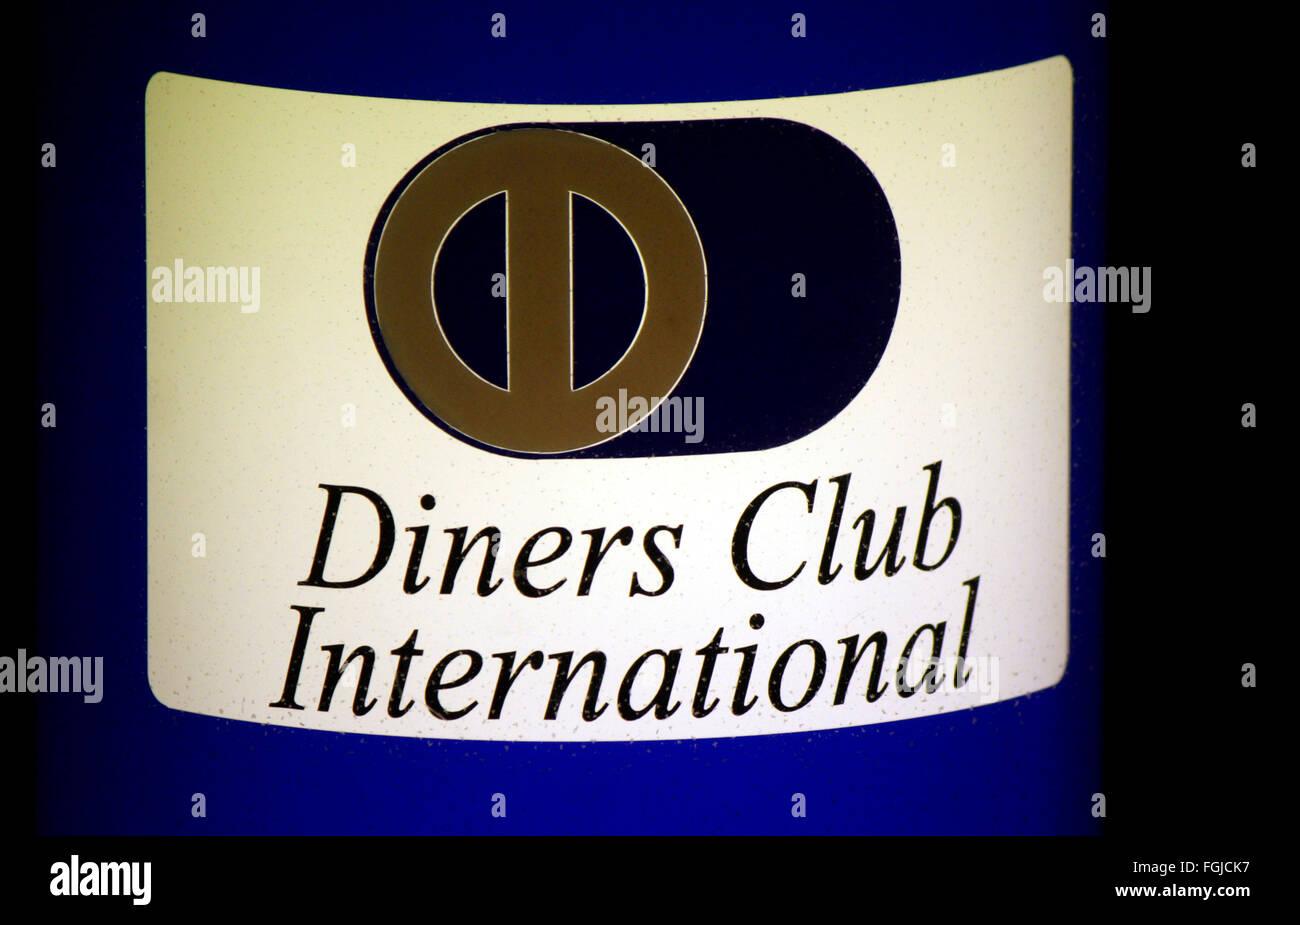 Markenname: 'Diners Club International', Berlin. - Stock Image